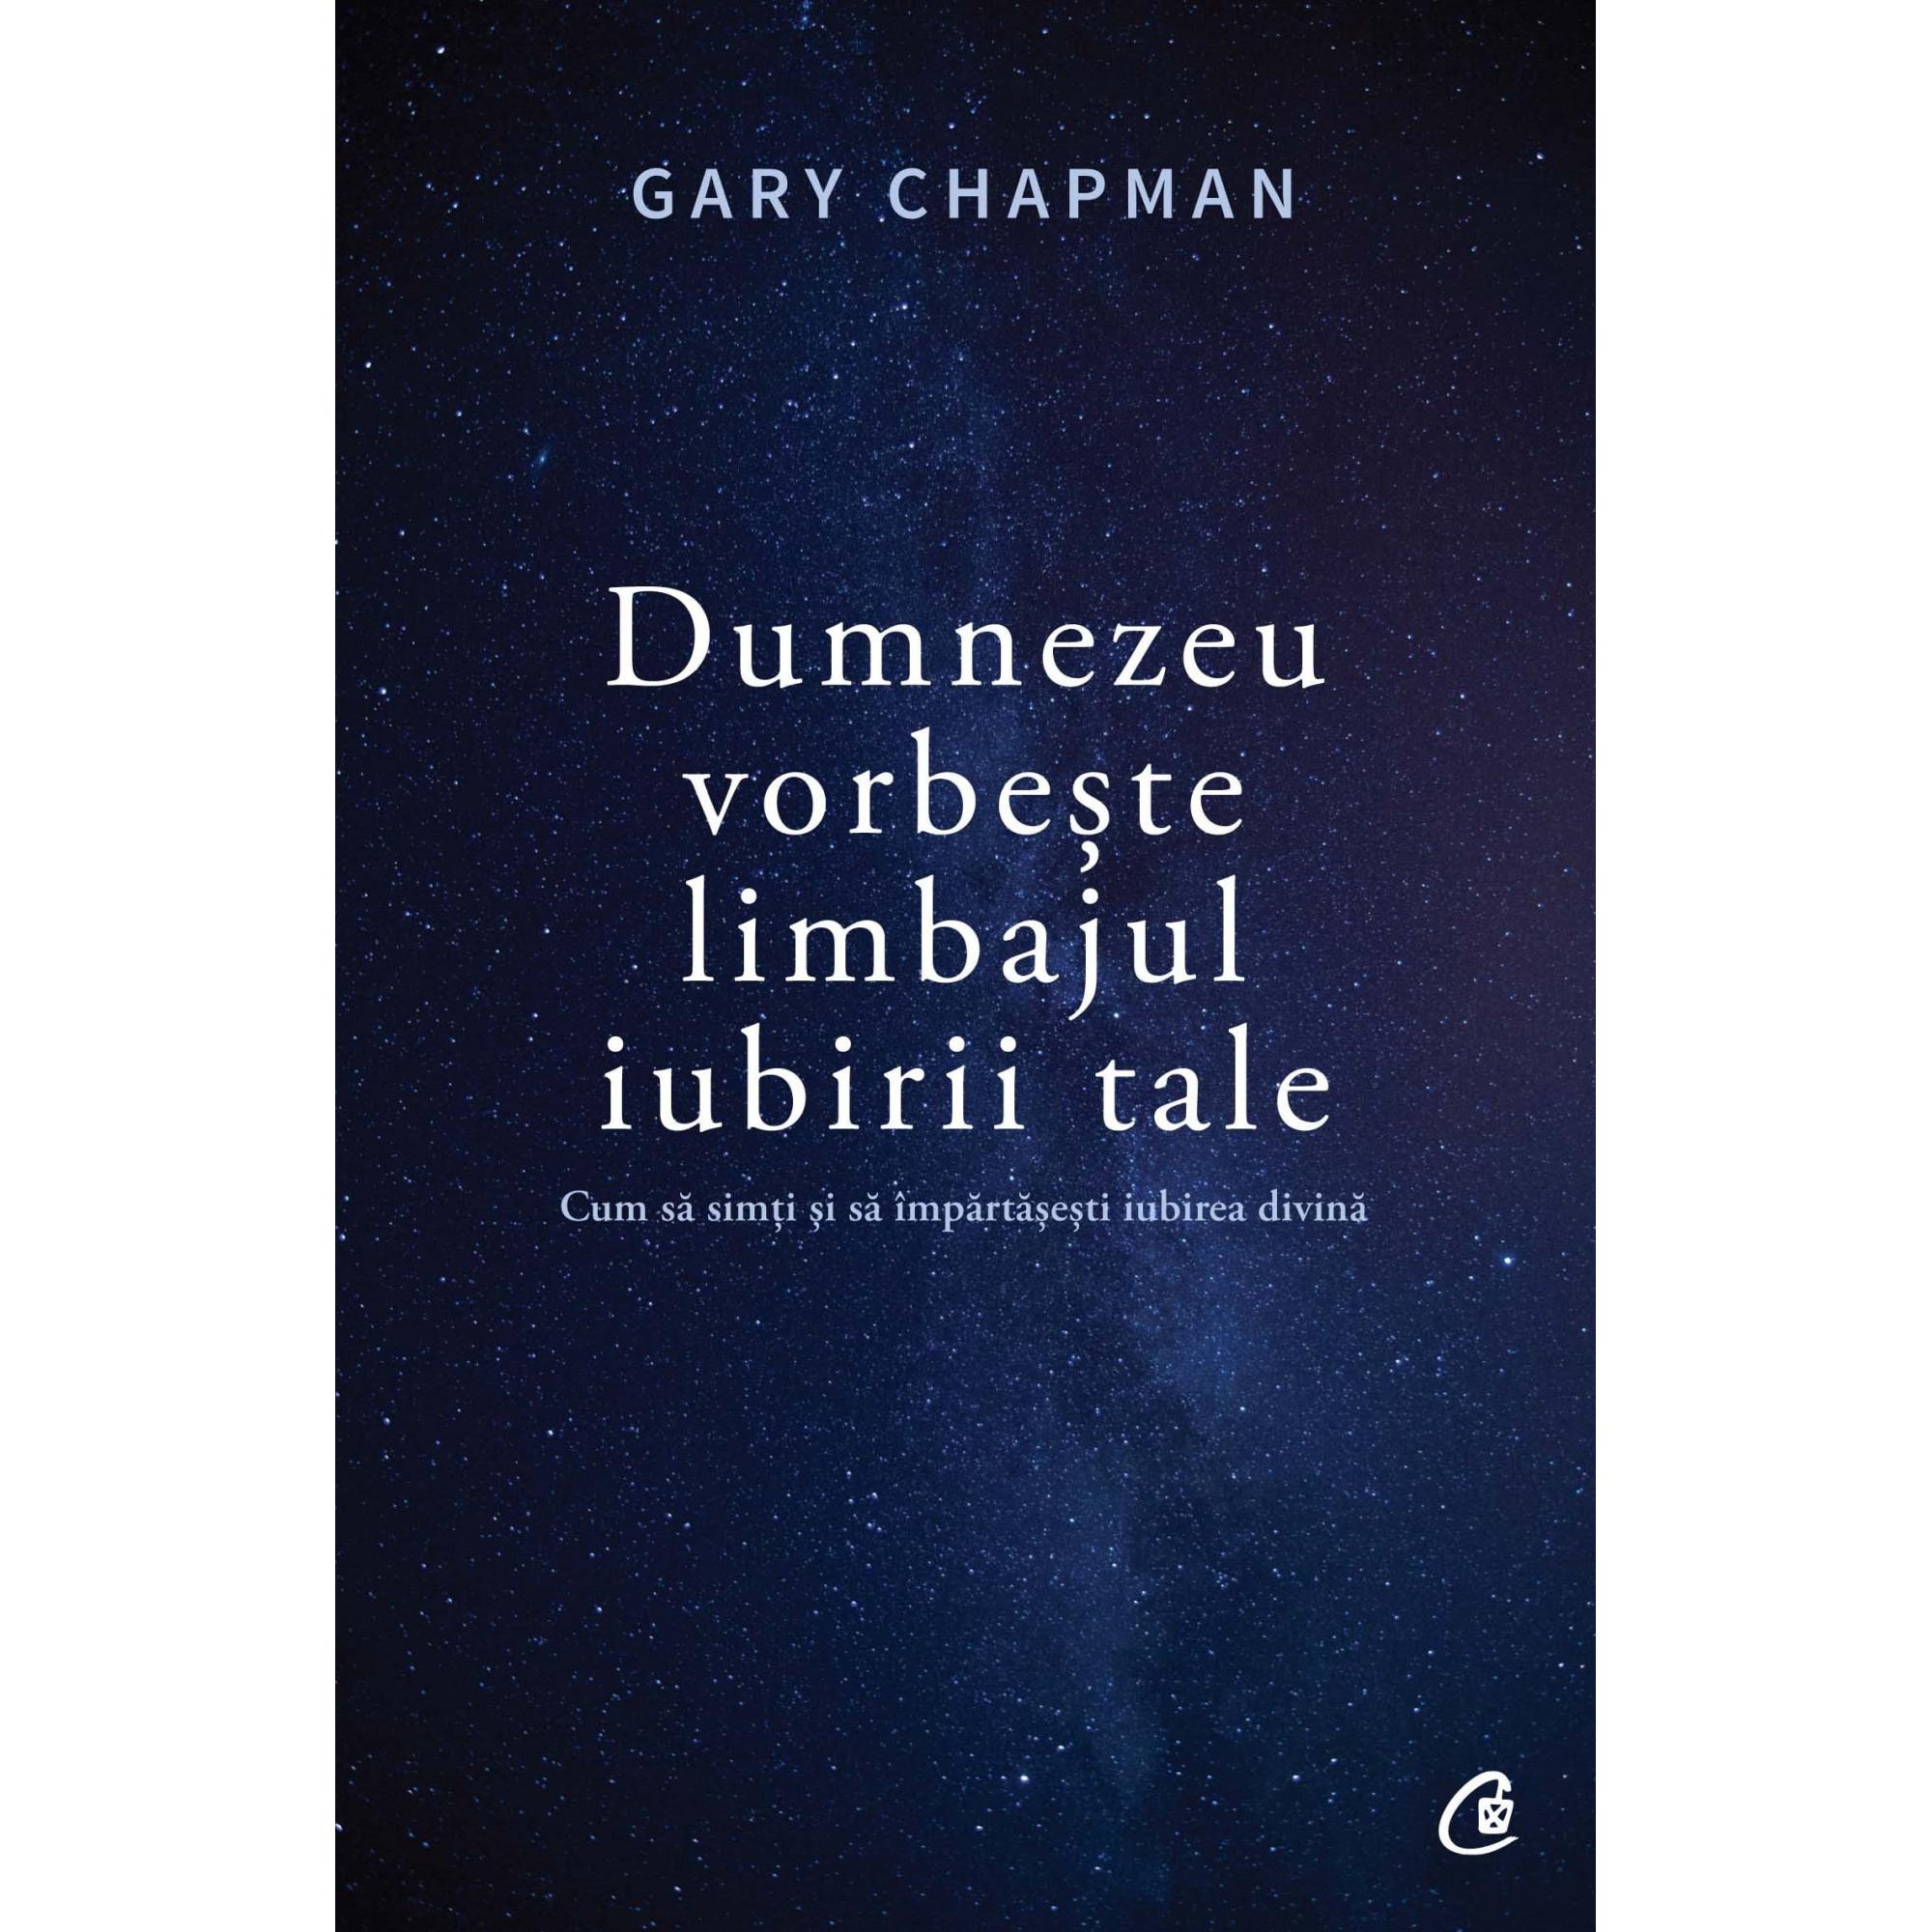 Dumnezeu vorbește limbajul iubirii tale; Gary Chapman